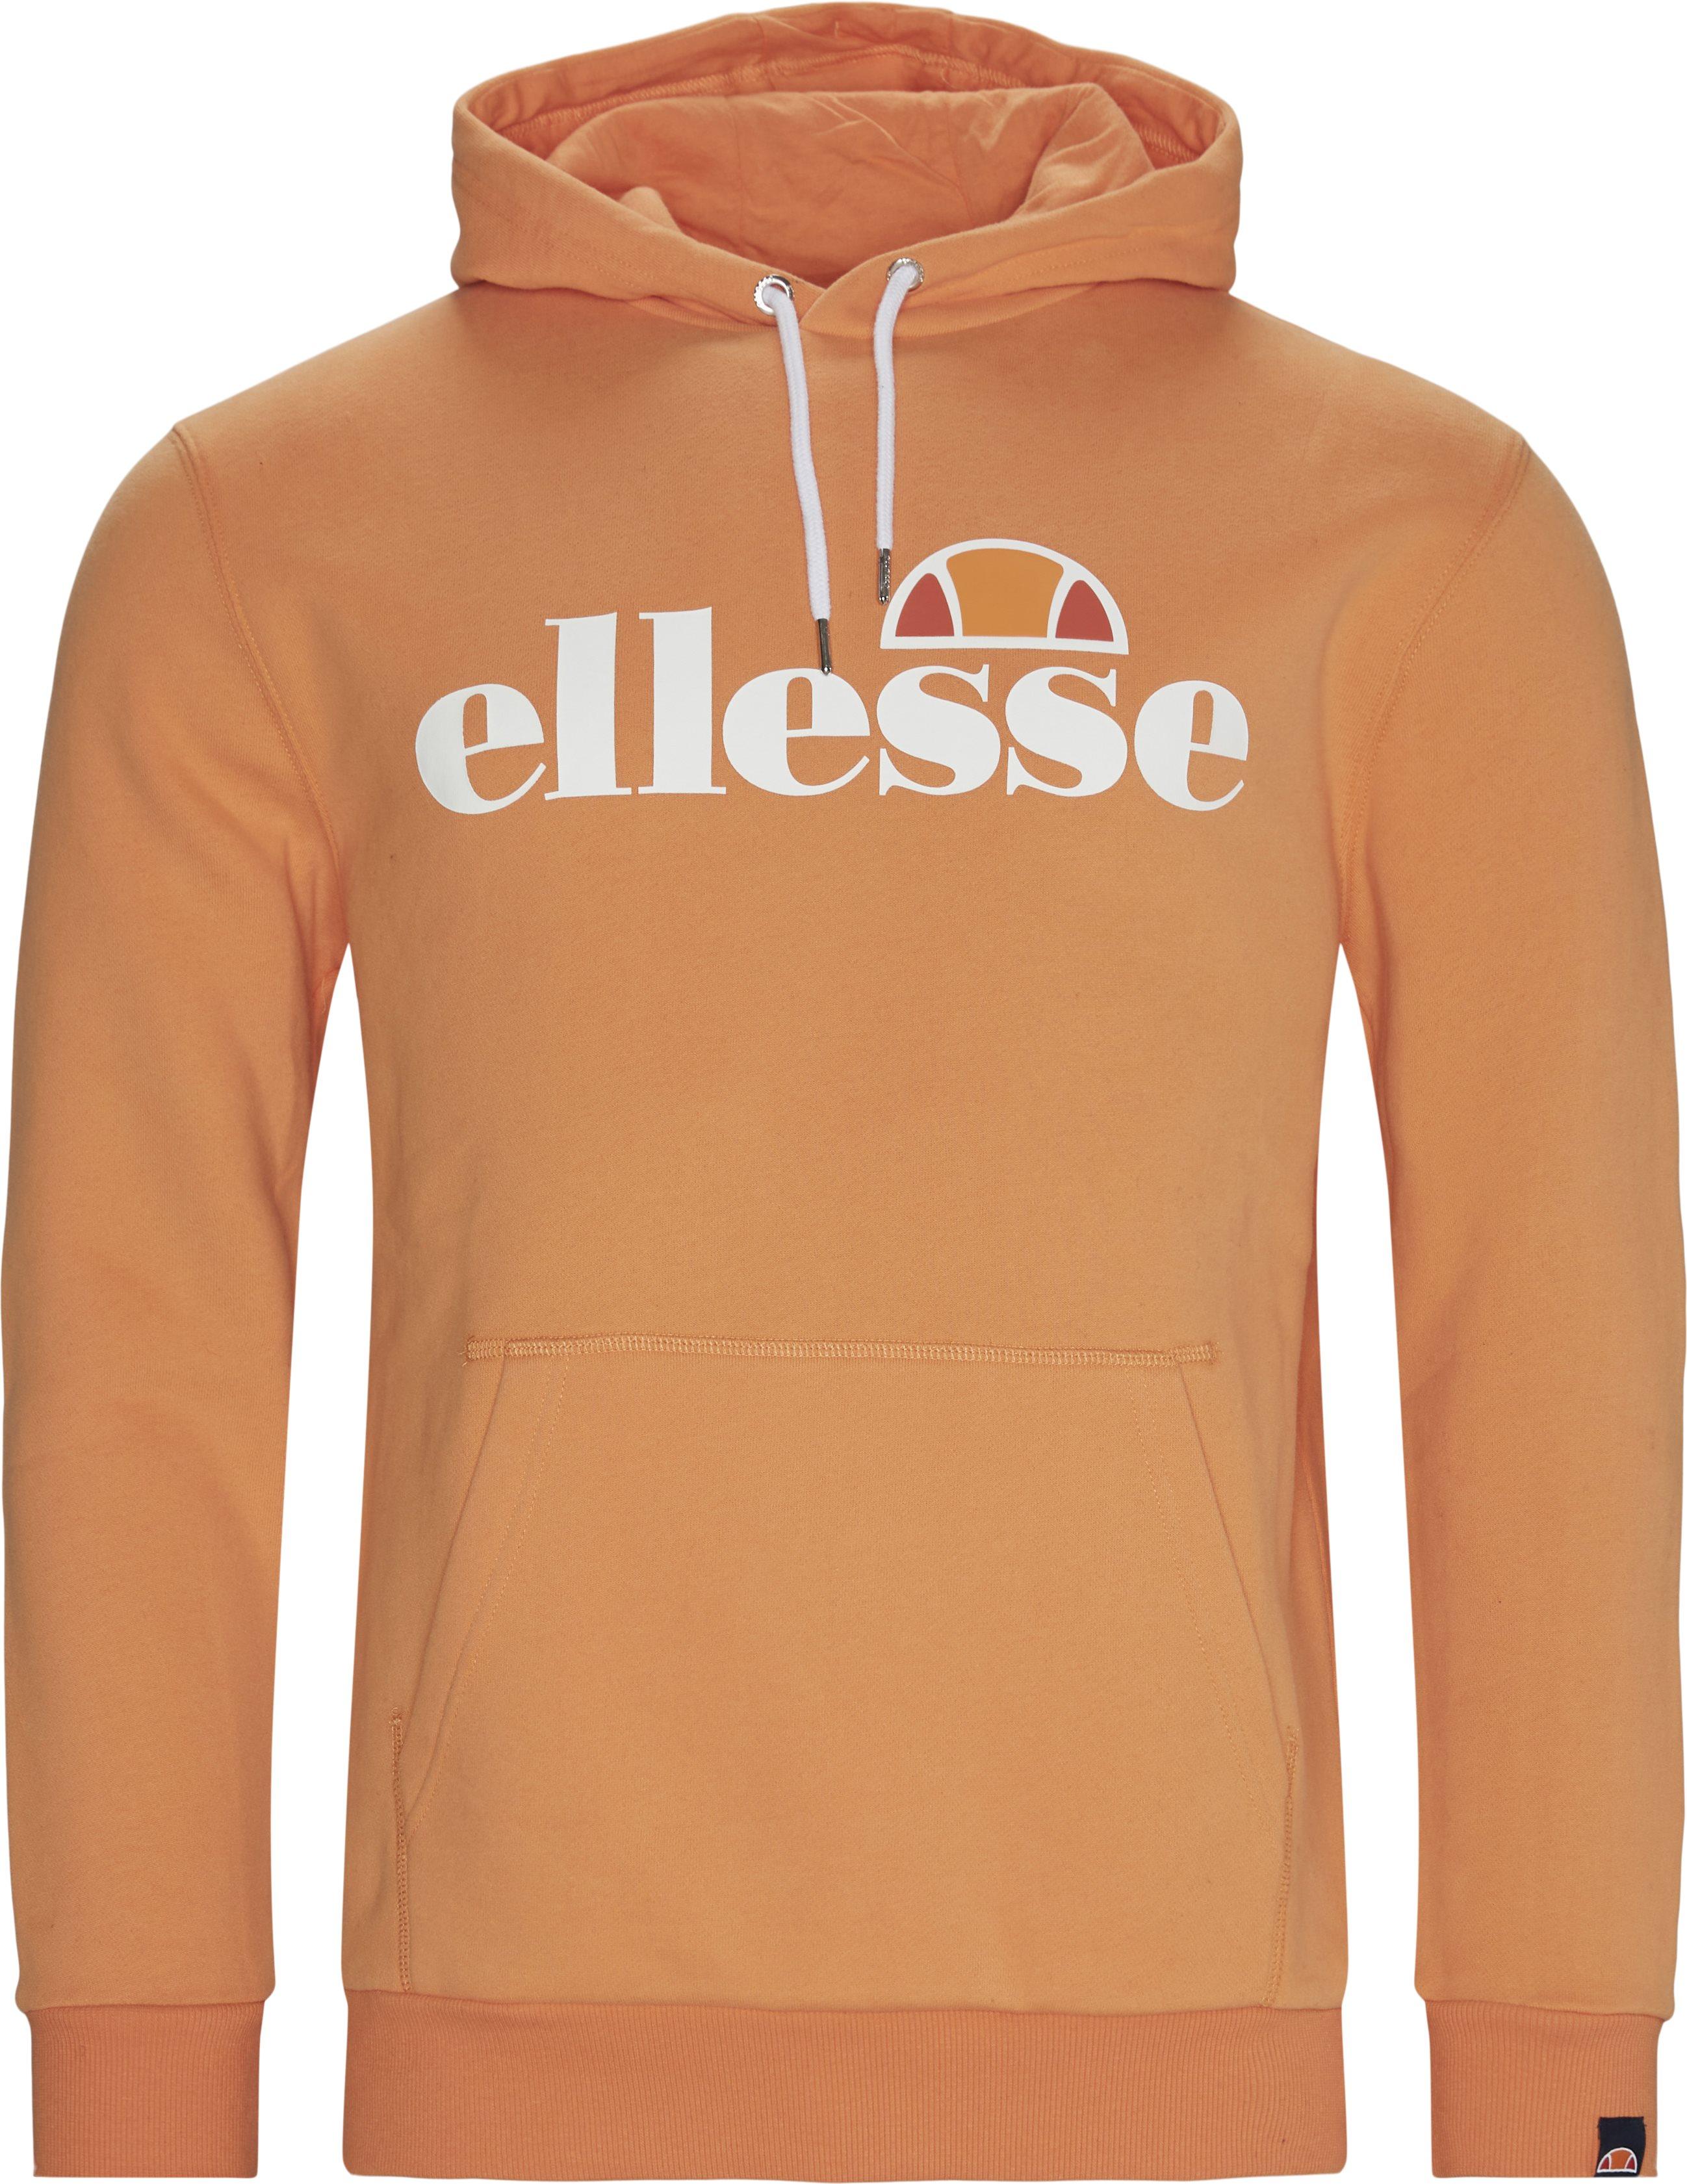 Gottero Hoodie - Sweatshirts - Regular fit - Orange